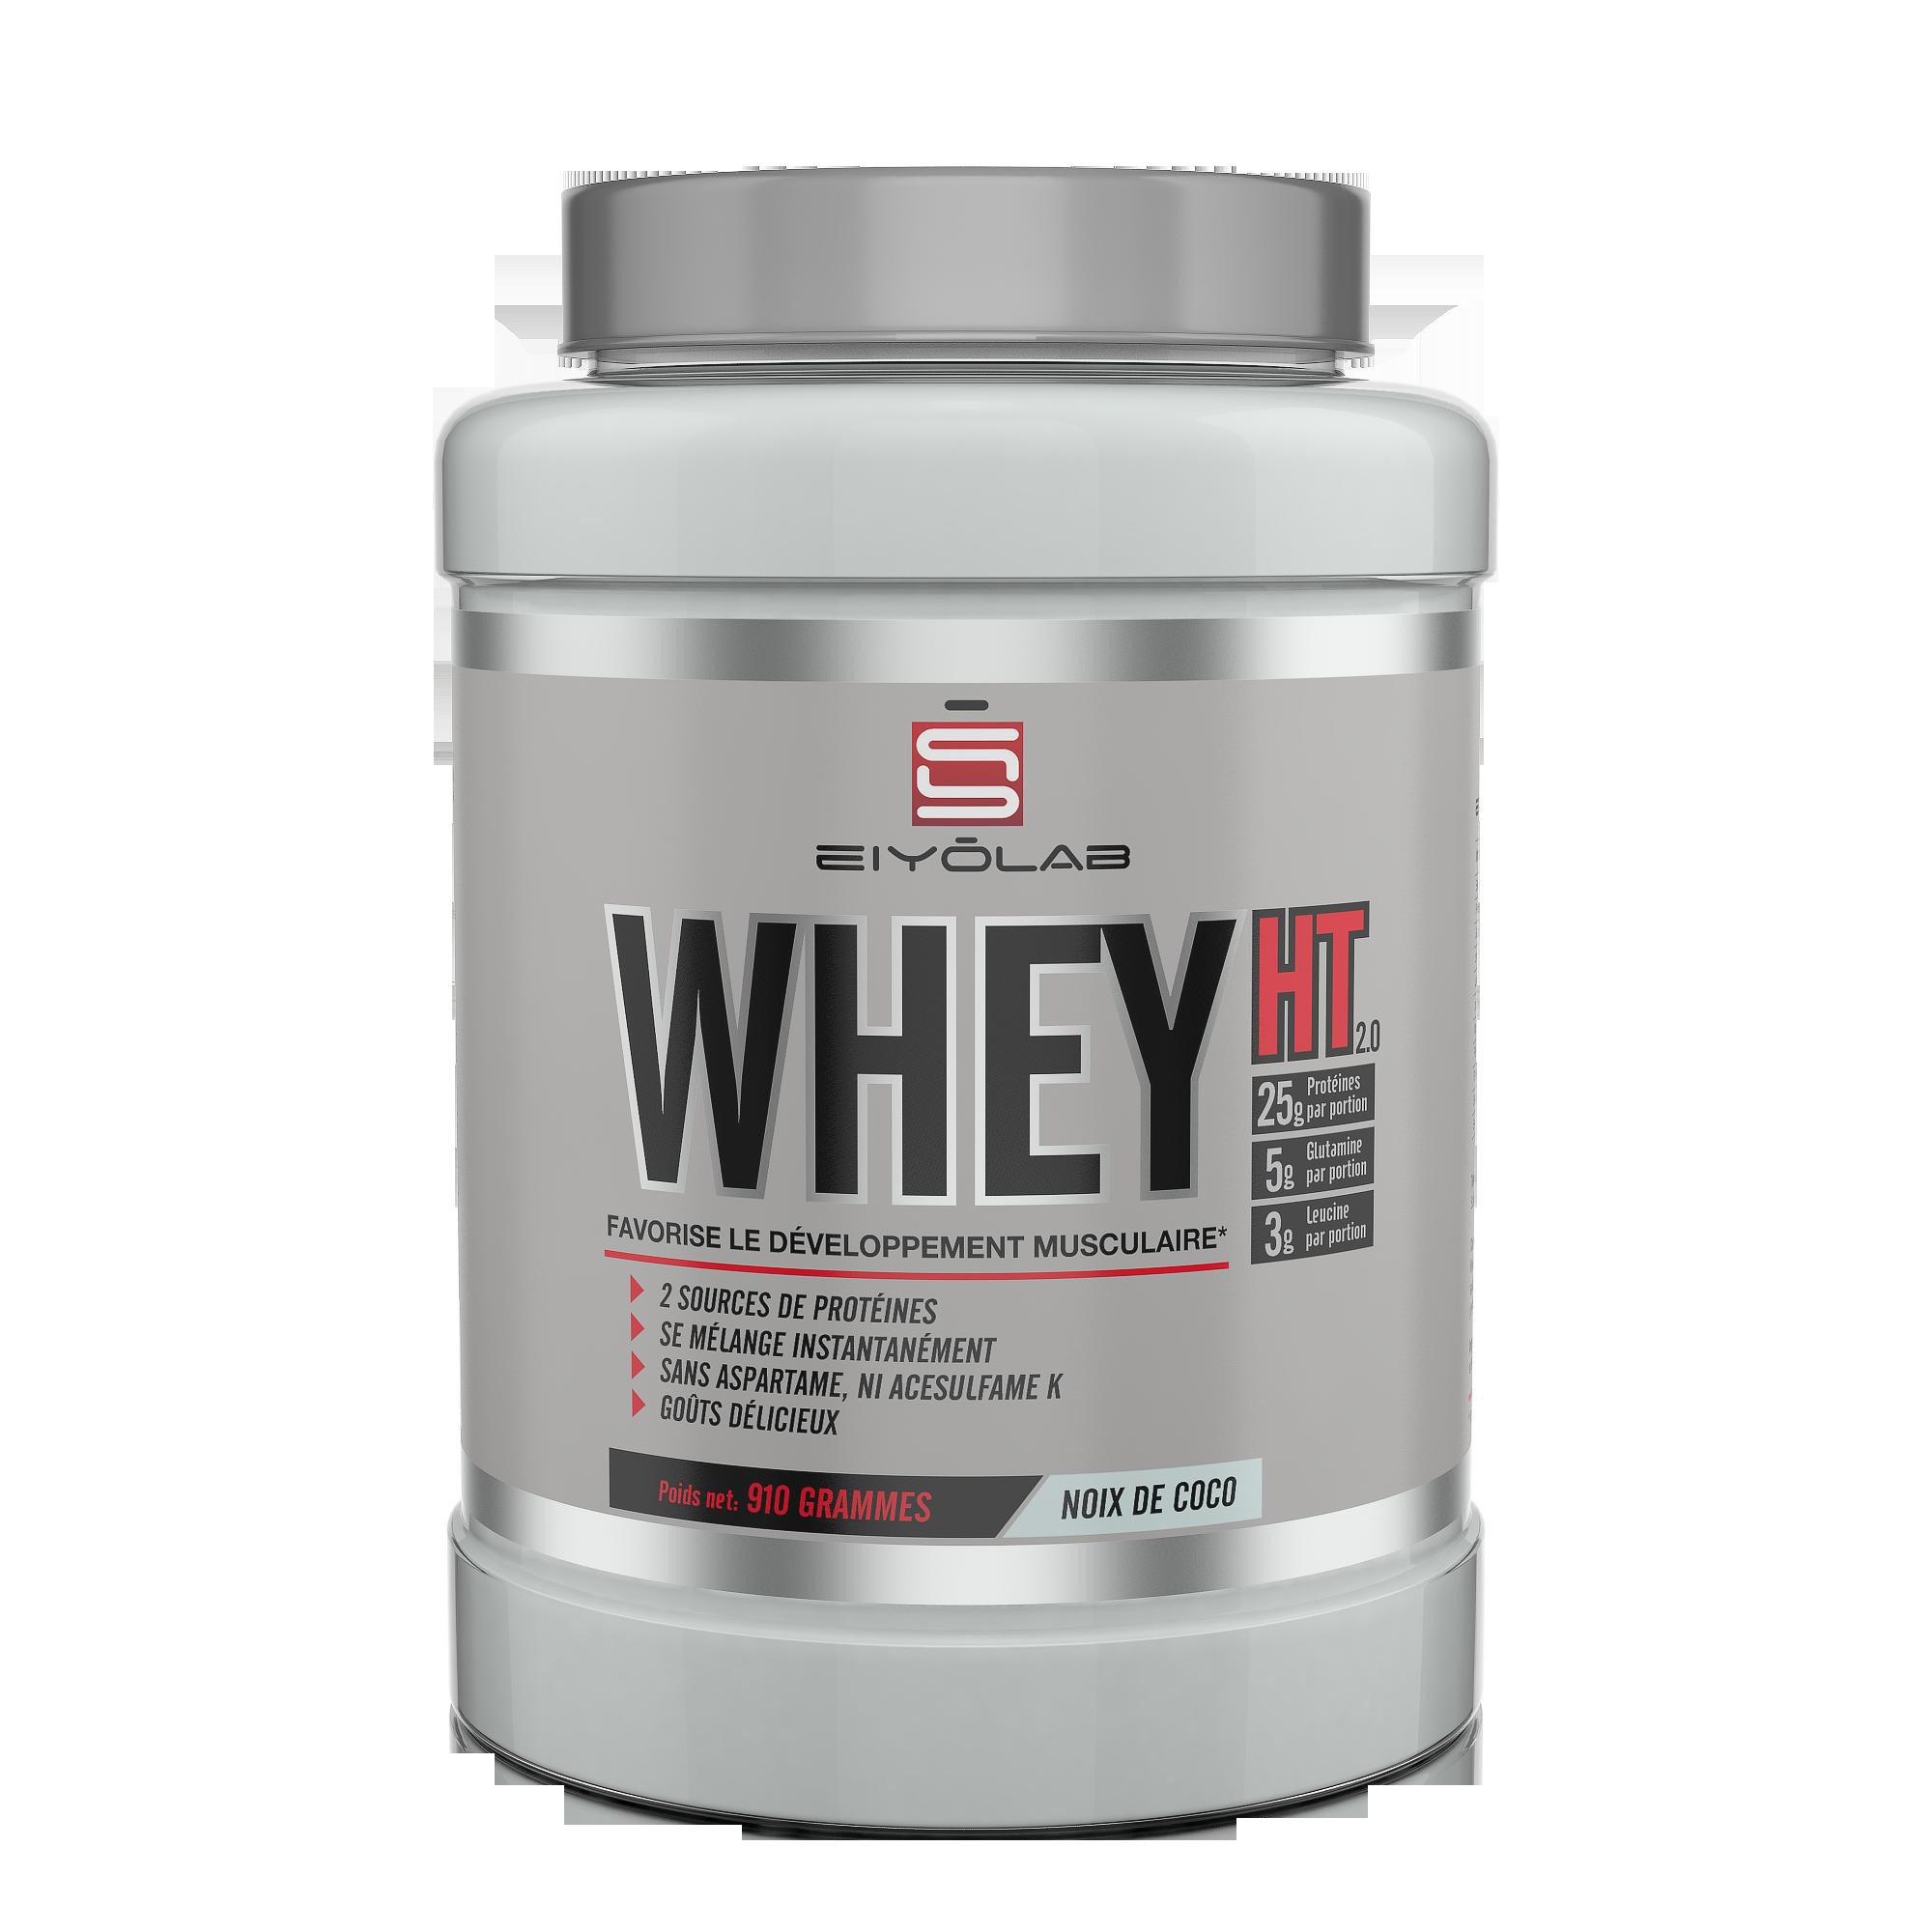 Whey HT 2.0 - Proteine Eiyolab | Toutelanutrition